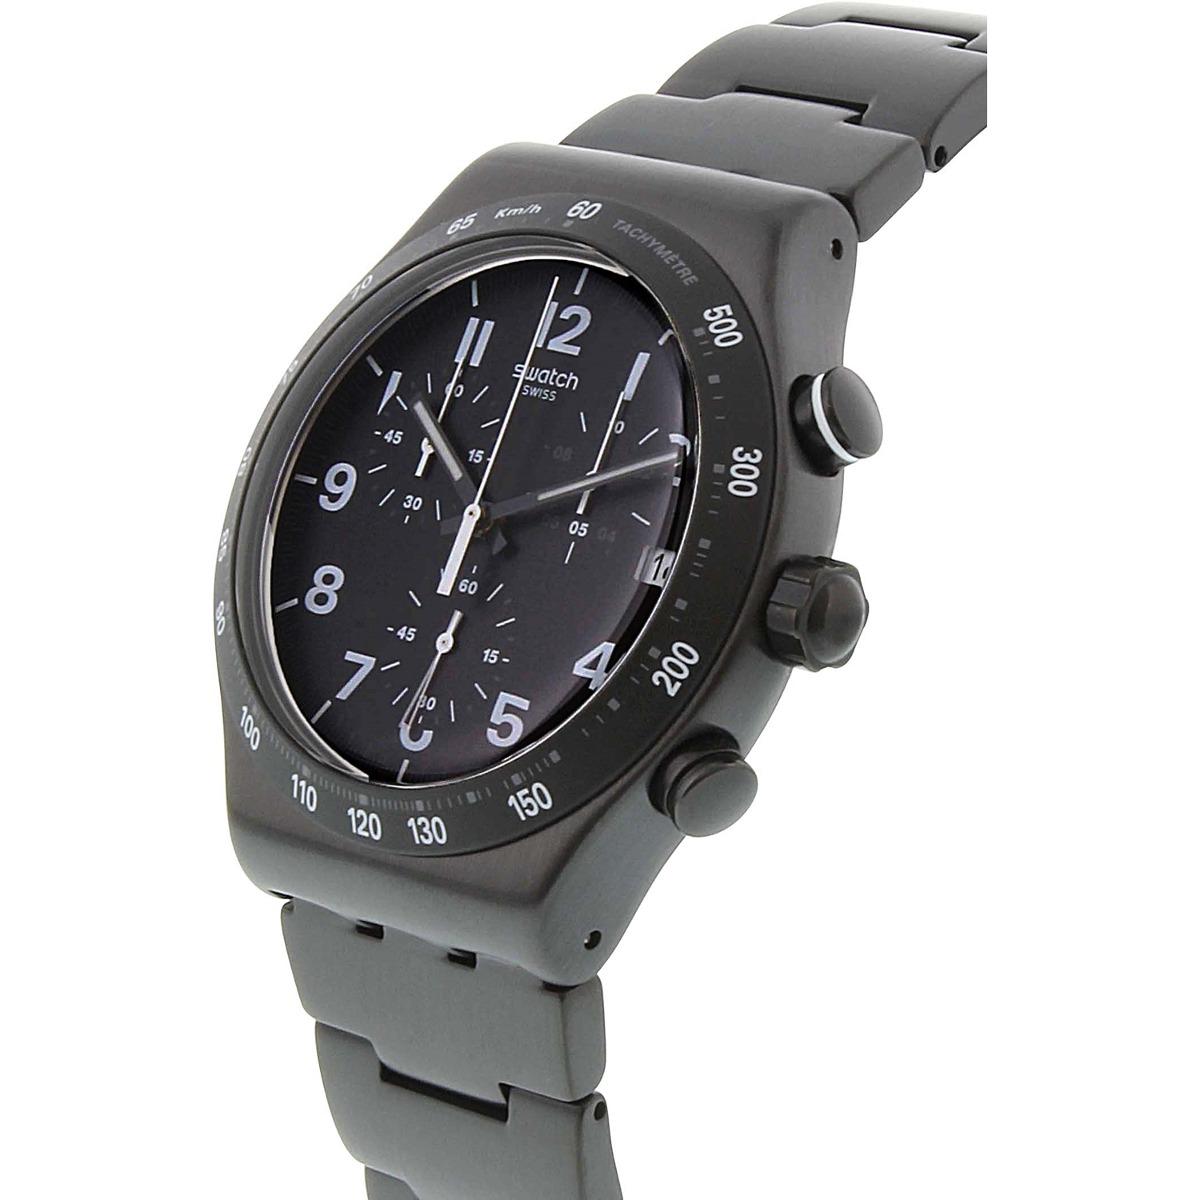 Reloj Swatch Para Hombre Yvb402g Negro Acero Inoxidable -   901.550 ... 9d1f5fecb7d8